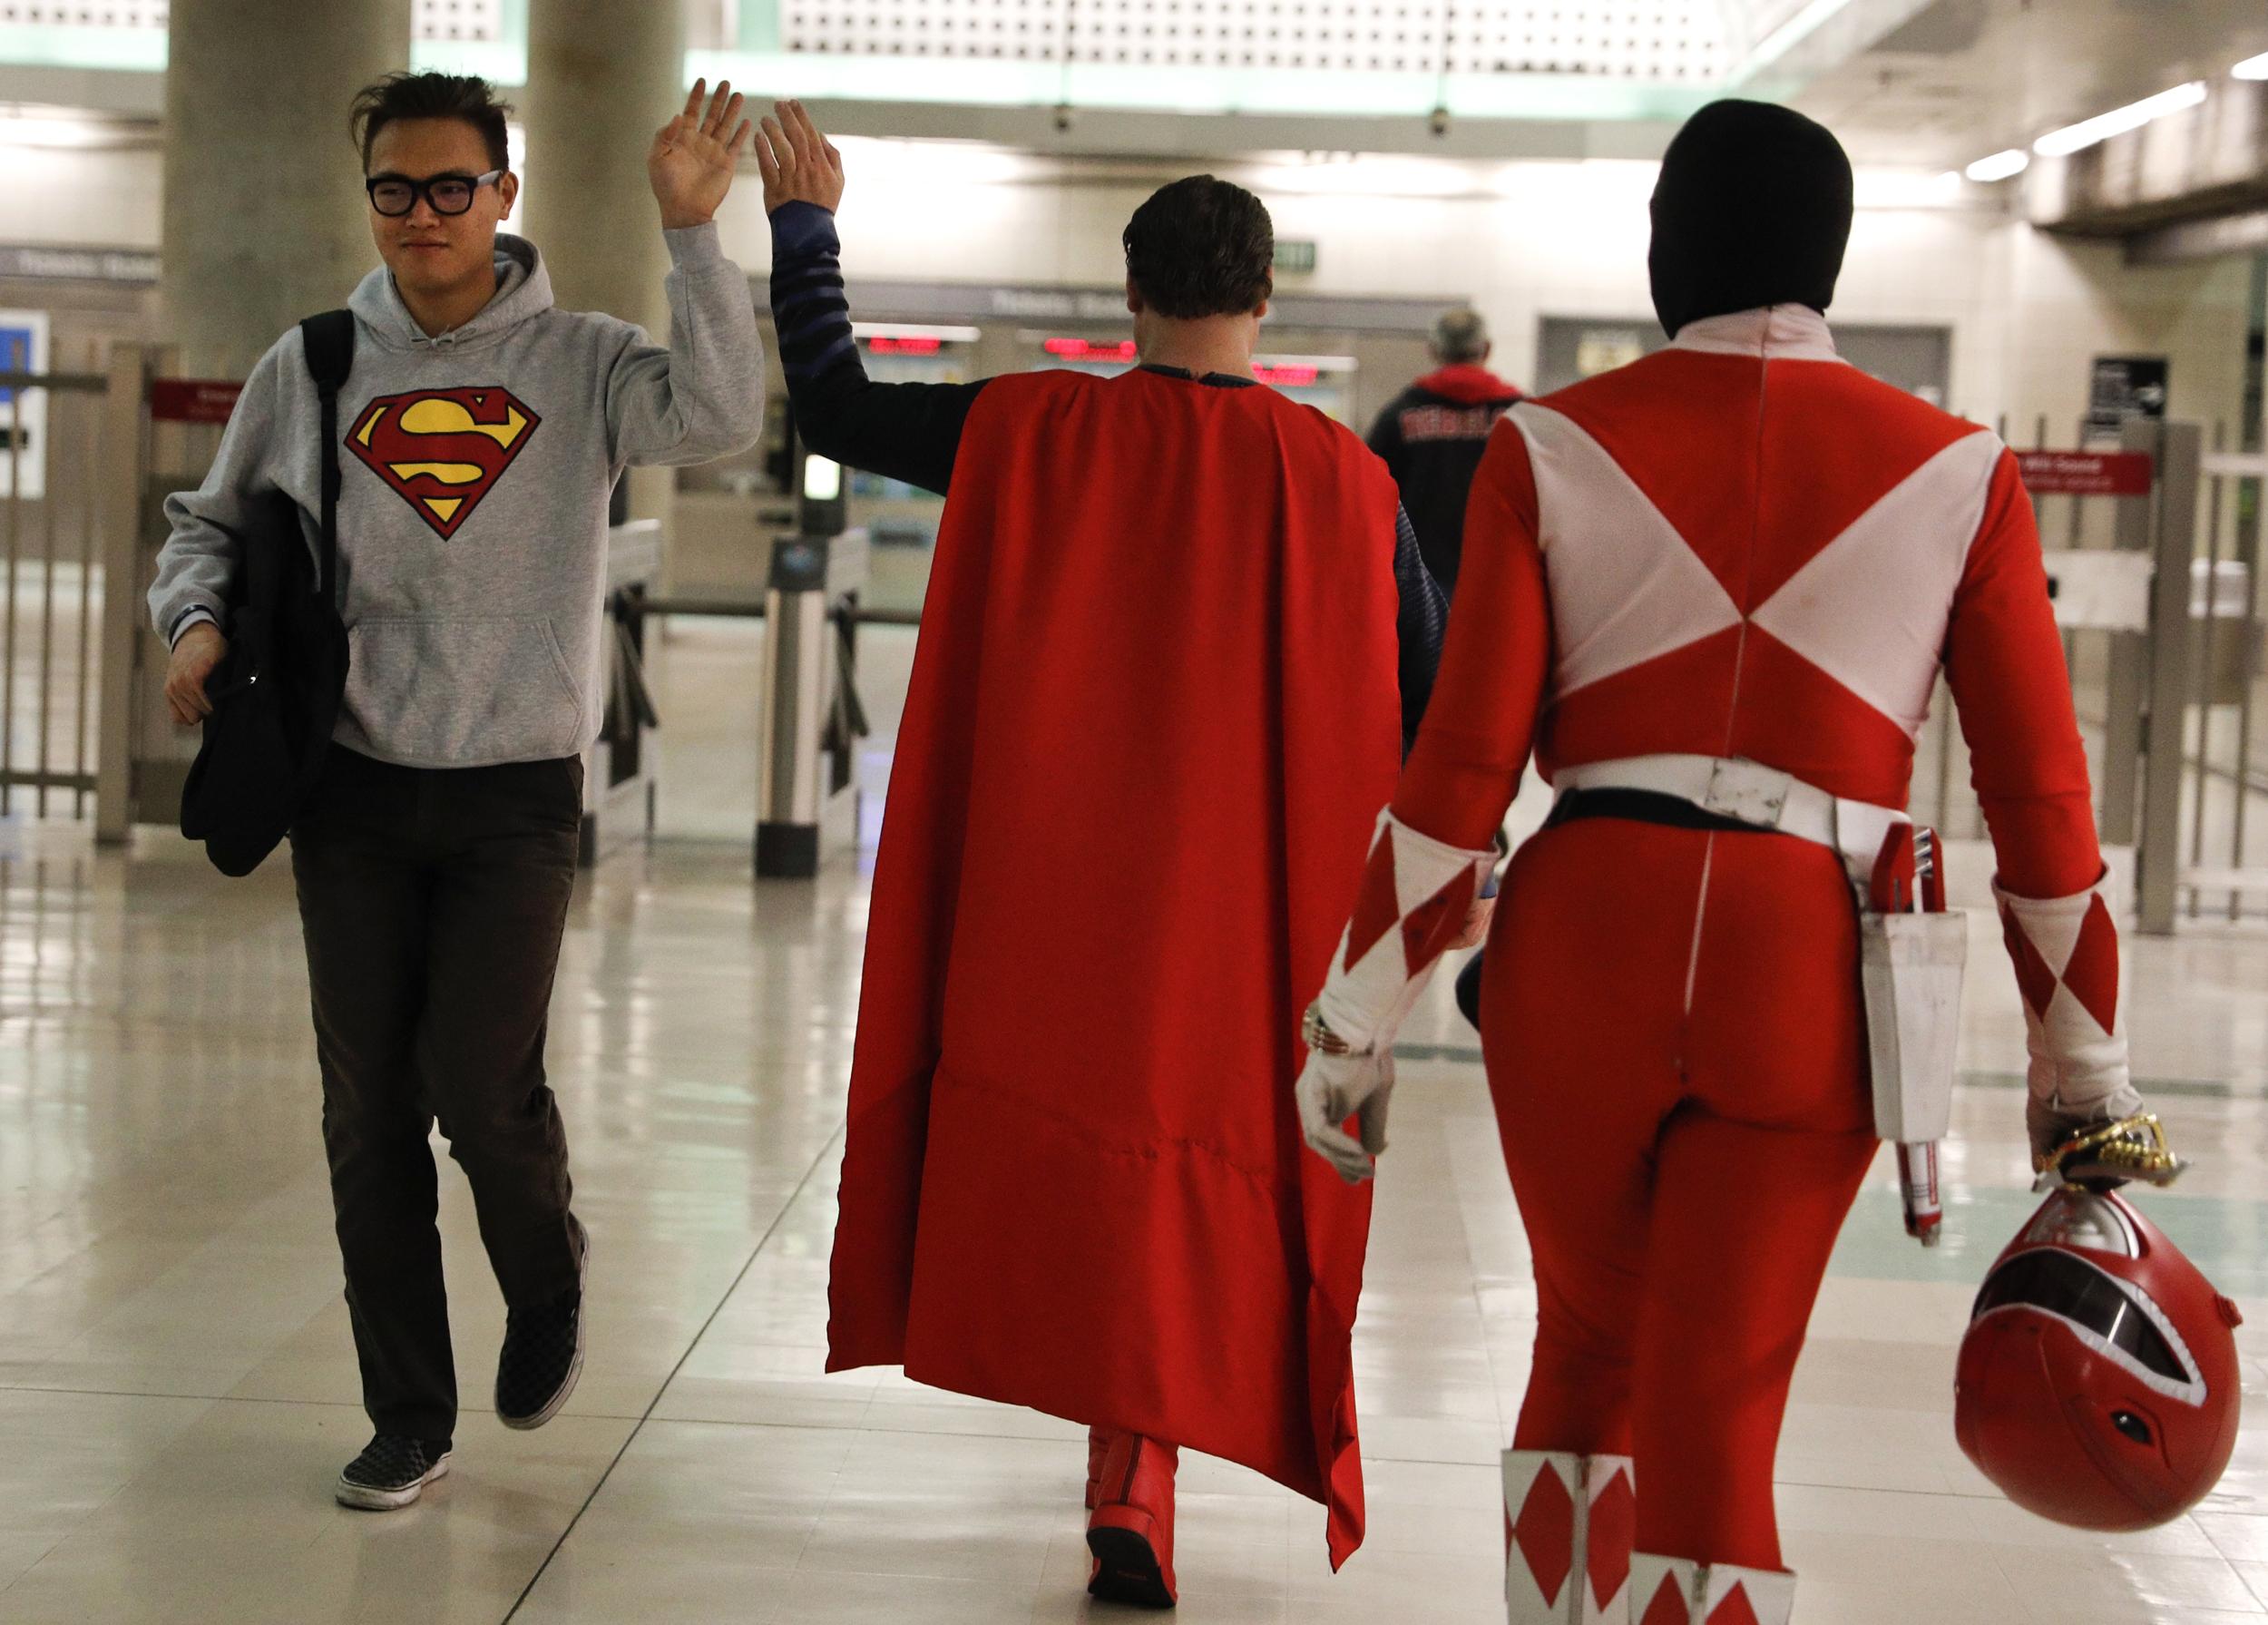 sc 1 st  NBC News & Superhero Costumes Keep Dreams Alive for Hollywood Hopefuls